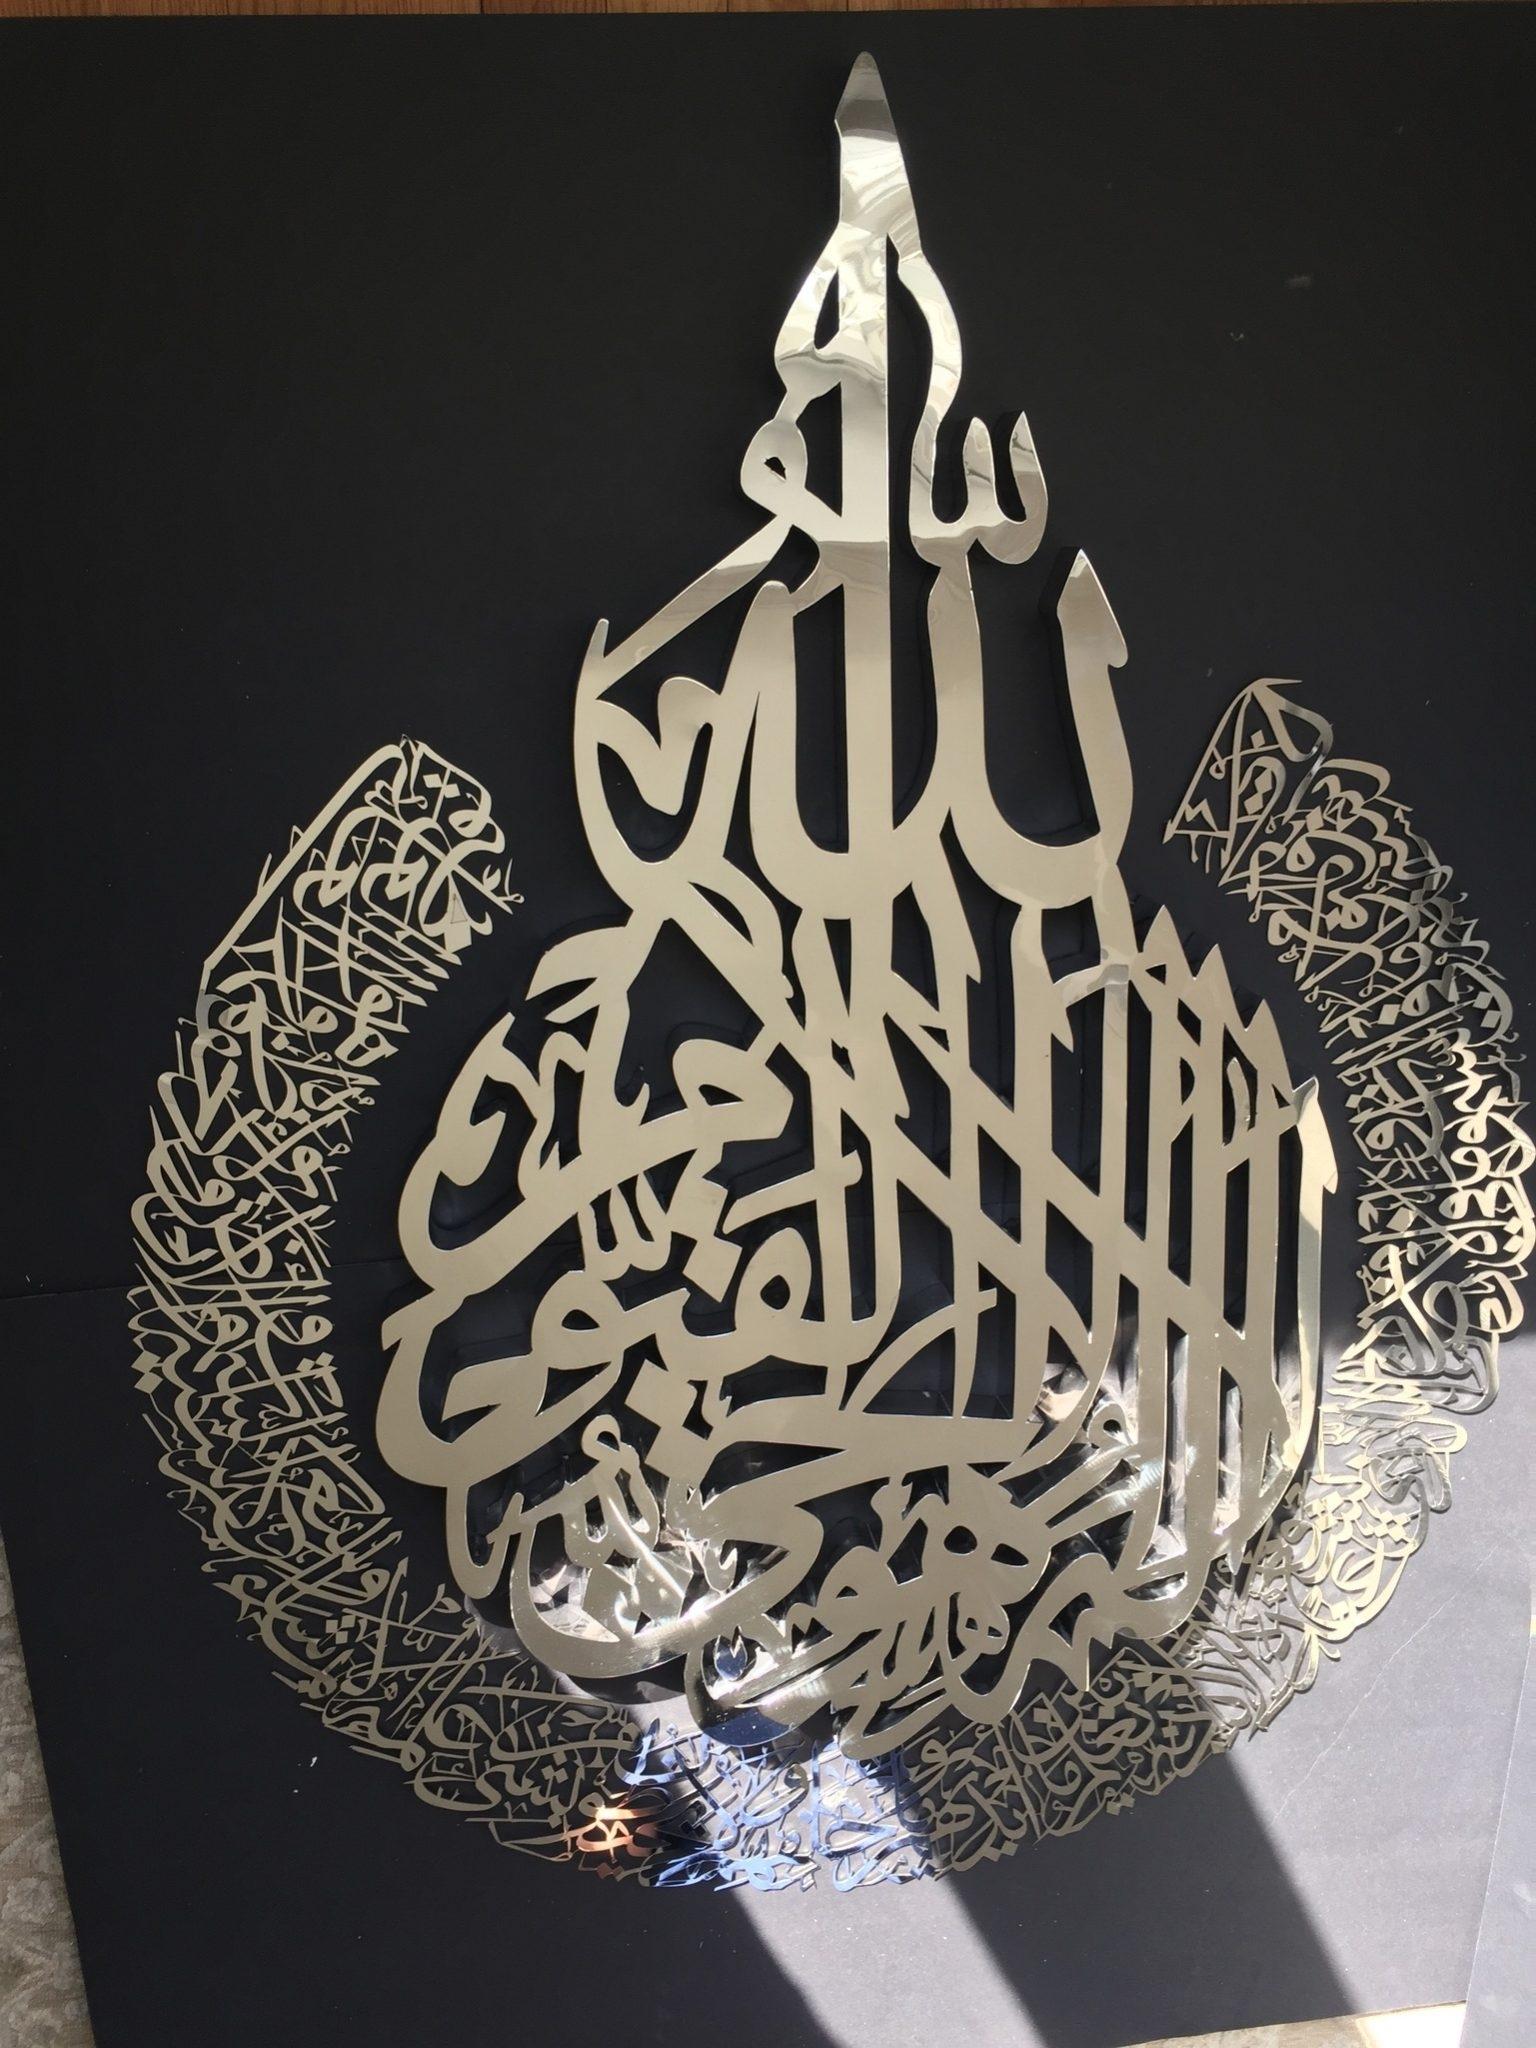 Ayatul Kursi Stainless Steel Modern Islamic Wall Art Arabic With Regard To Most Popular Islamic Wall Art (View 4 of 15)